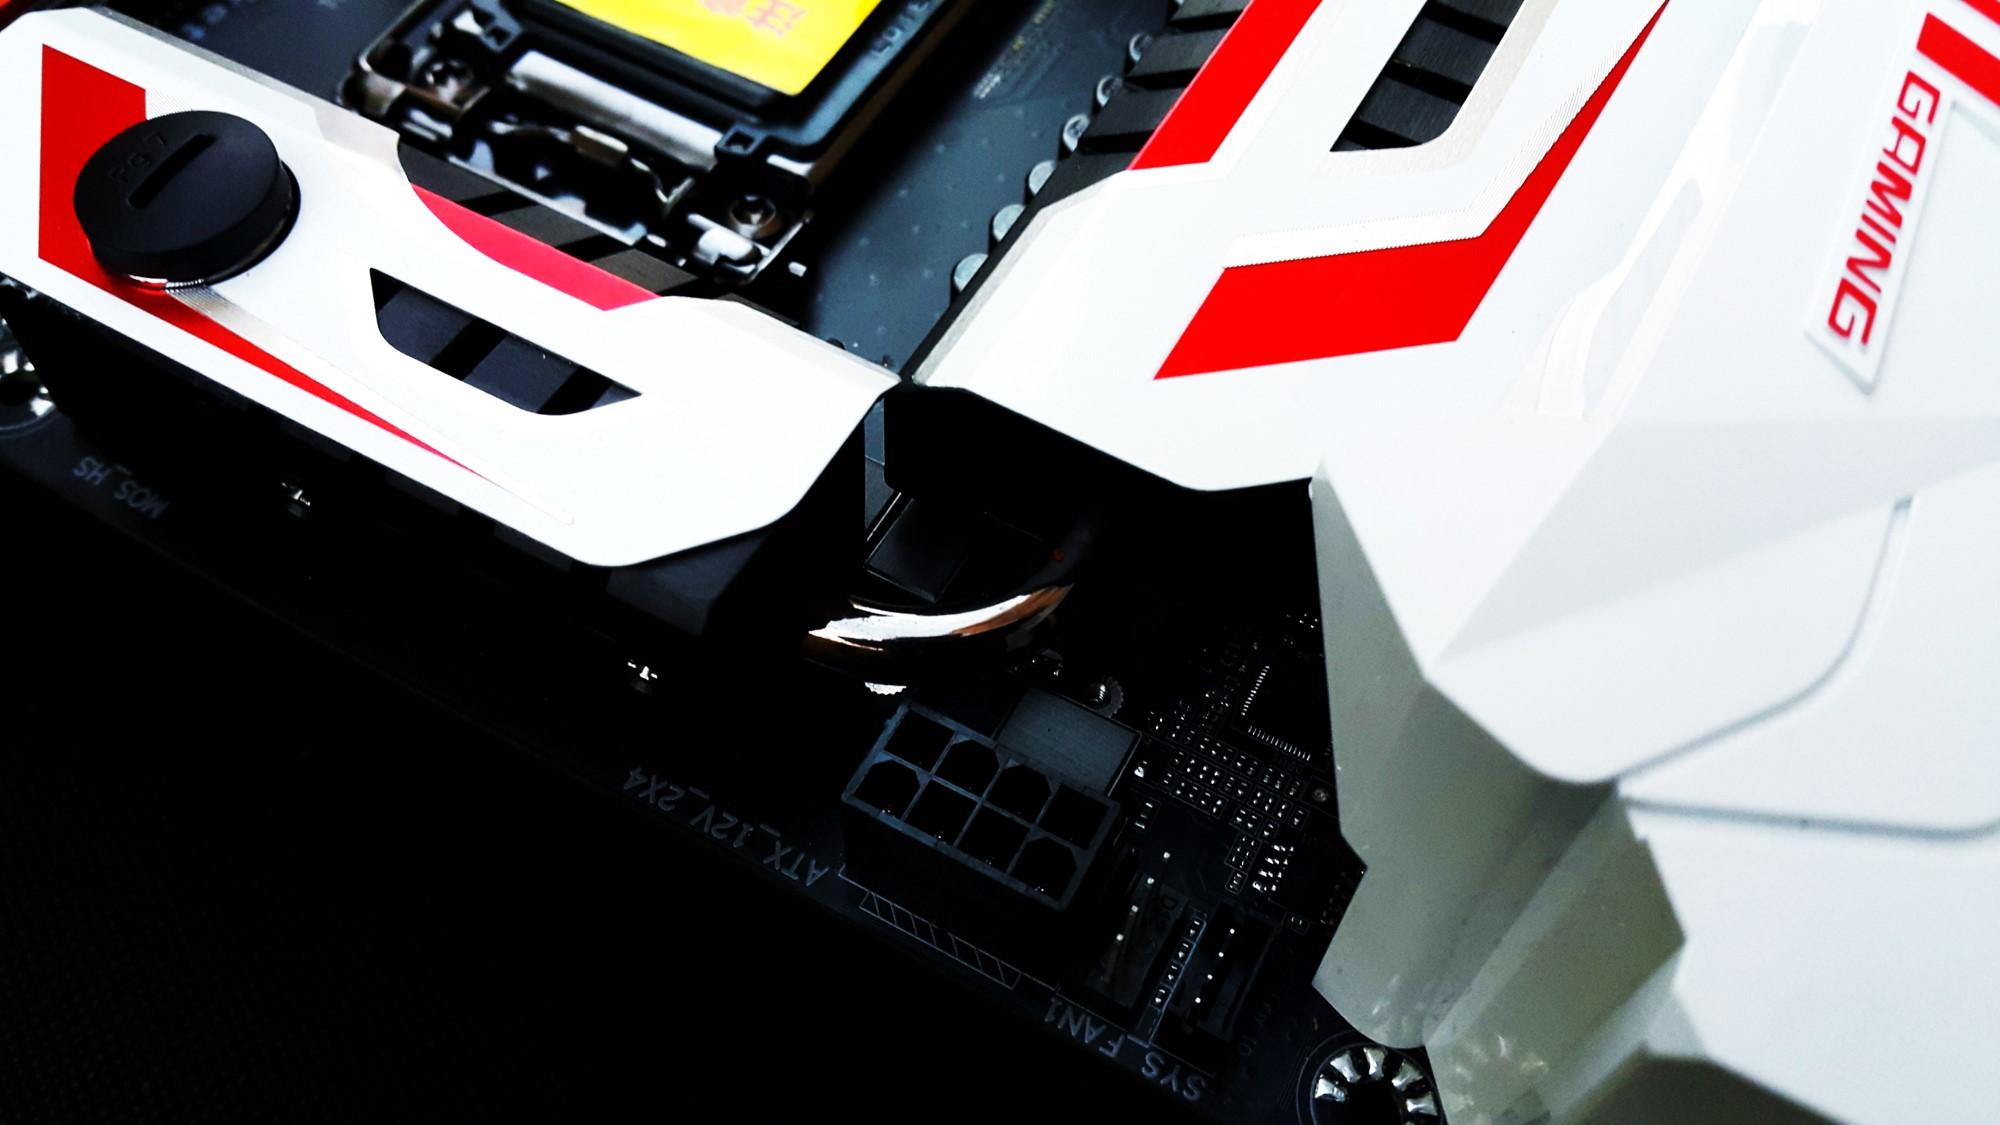 Gigabyte Z170X Gaming G1 8Pin